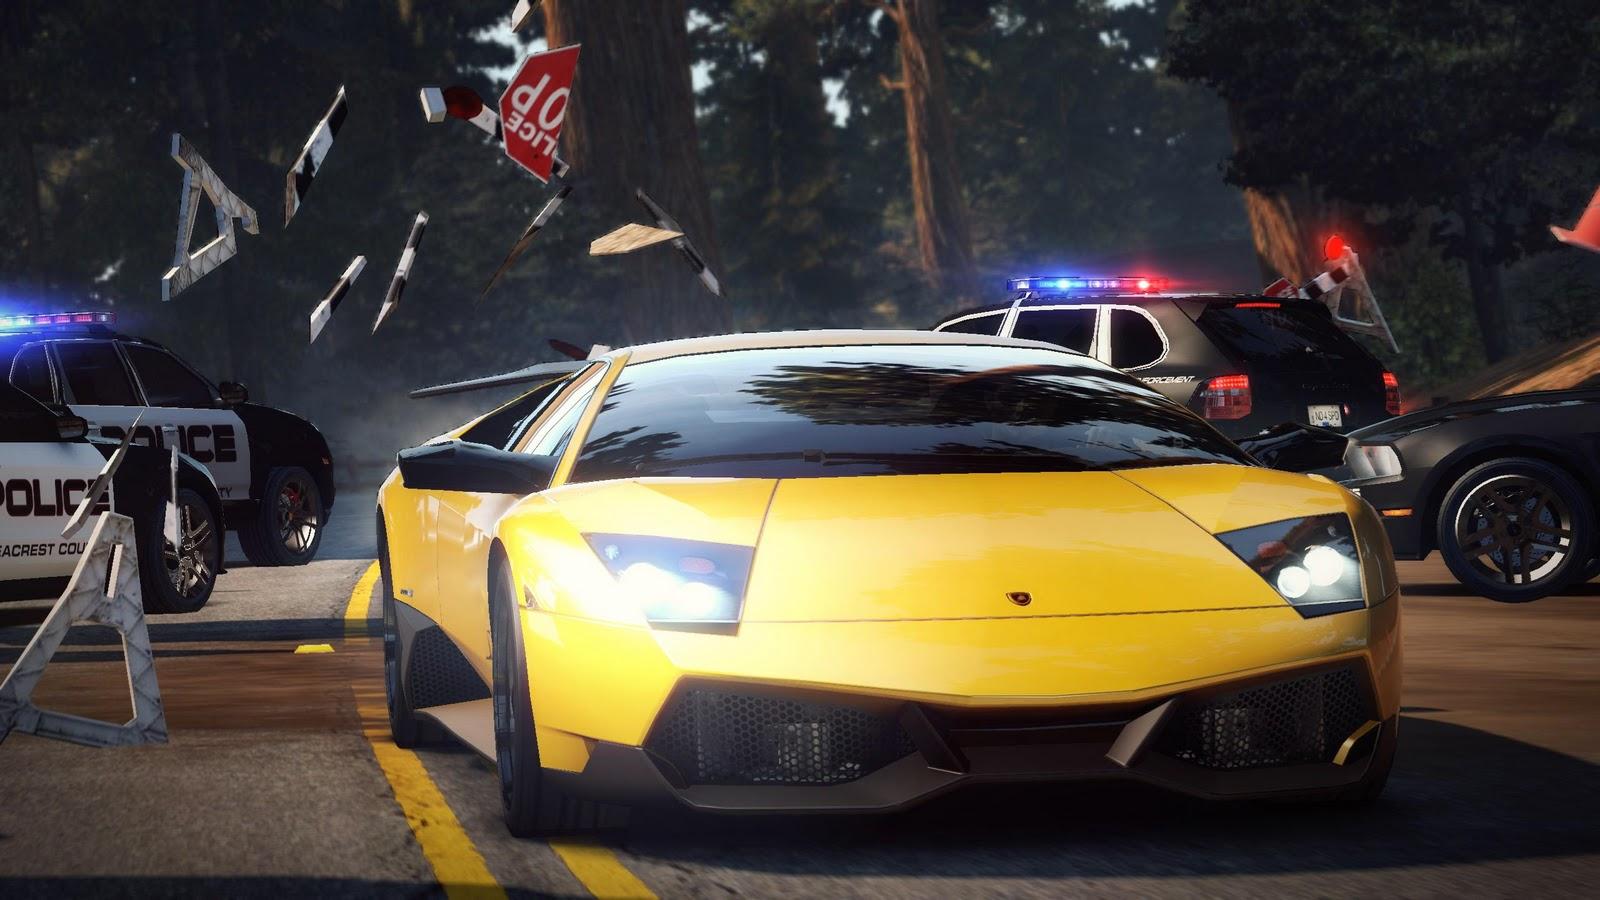 http://4.bp.blogspot.com/_eLlOaWaTNCw/TTcOrwSLhJI/AAAAAAAAAO8/2qwn120GtrI/s1600/Lamborghini-NFS-Hot-Pursuit.jpg